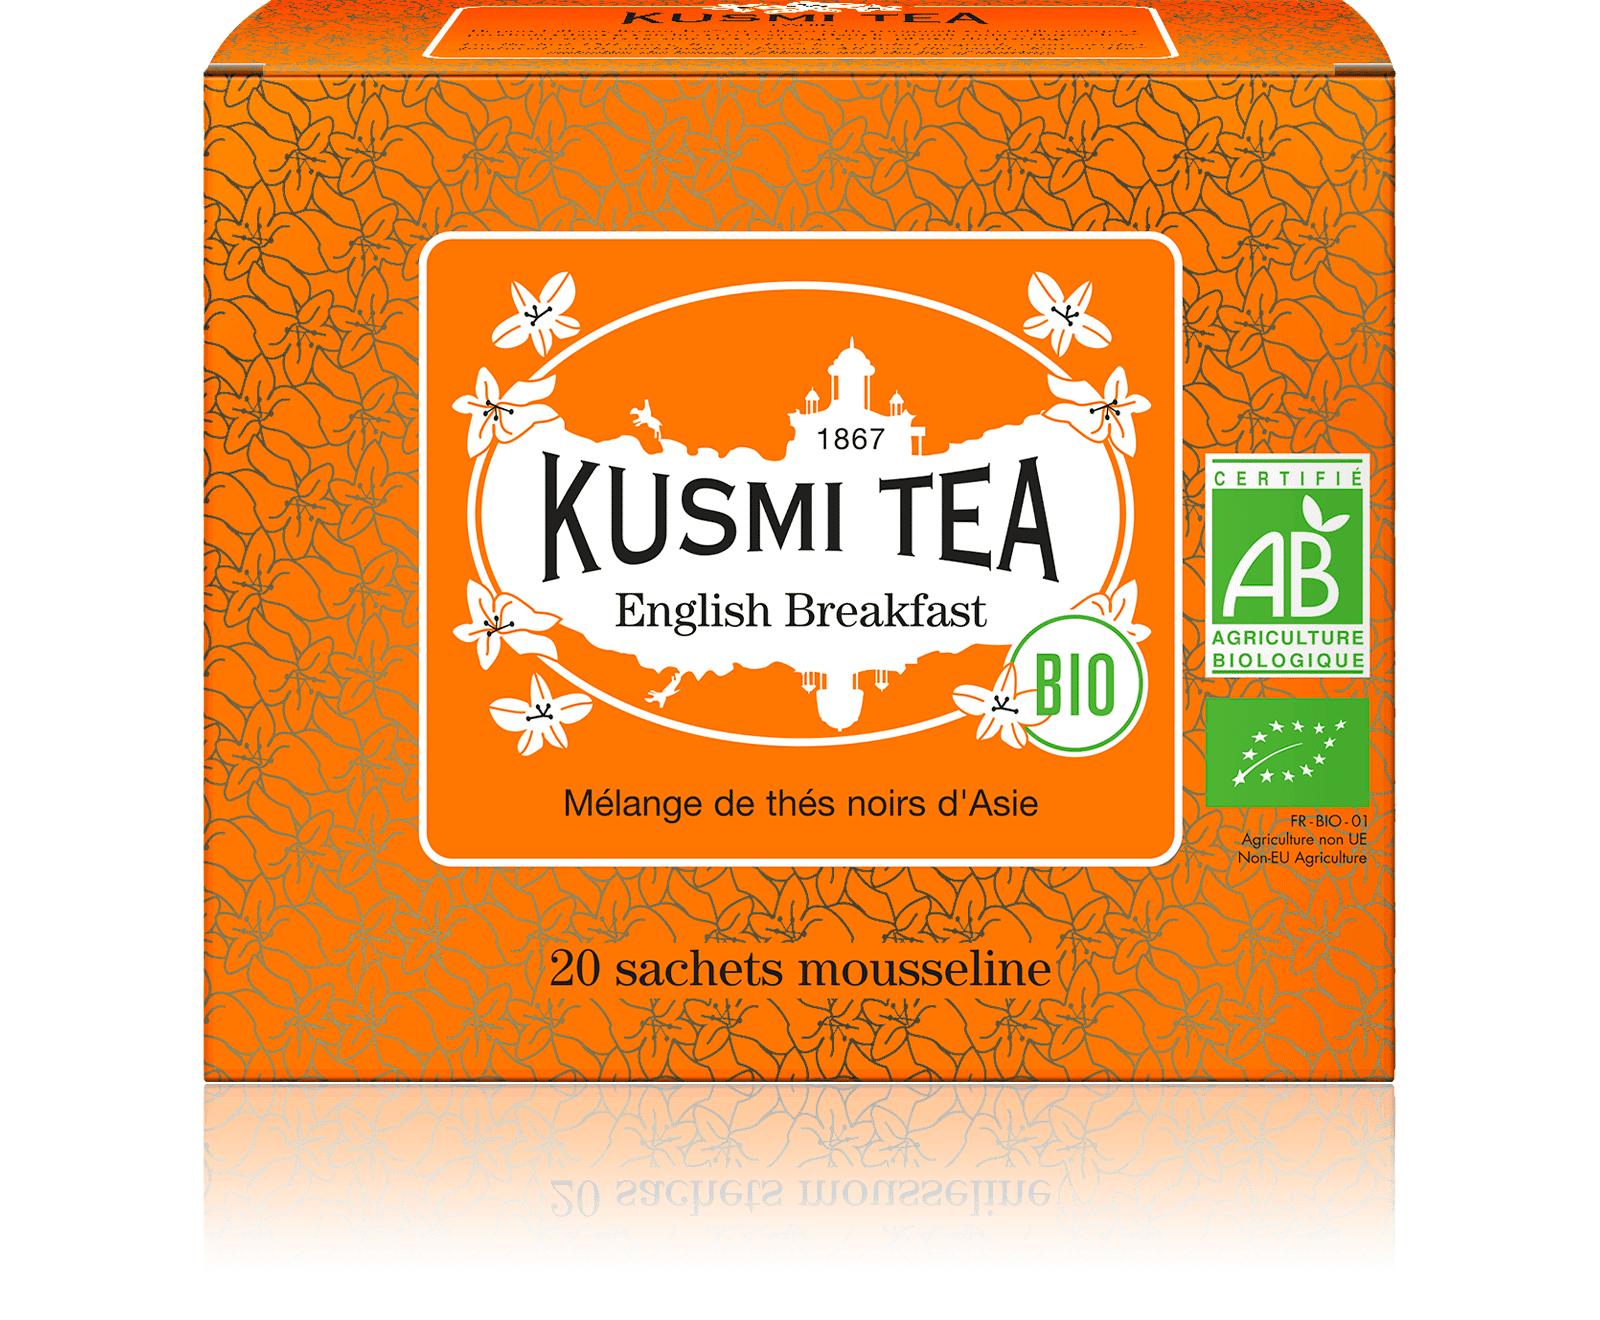 KUSMI TEA English Breakfast bio - Thé noir de Ceylan, Assam - Sachets de thé - Kusmi Tea